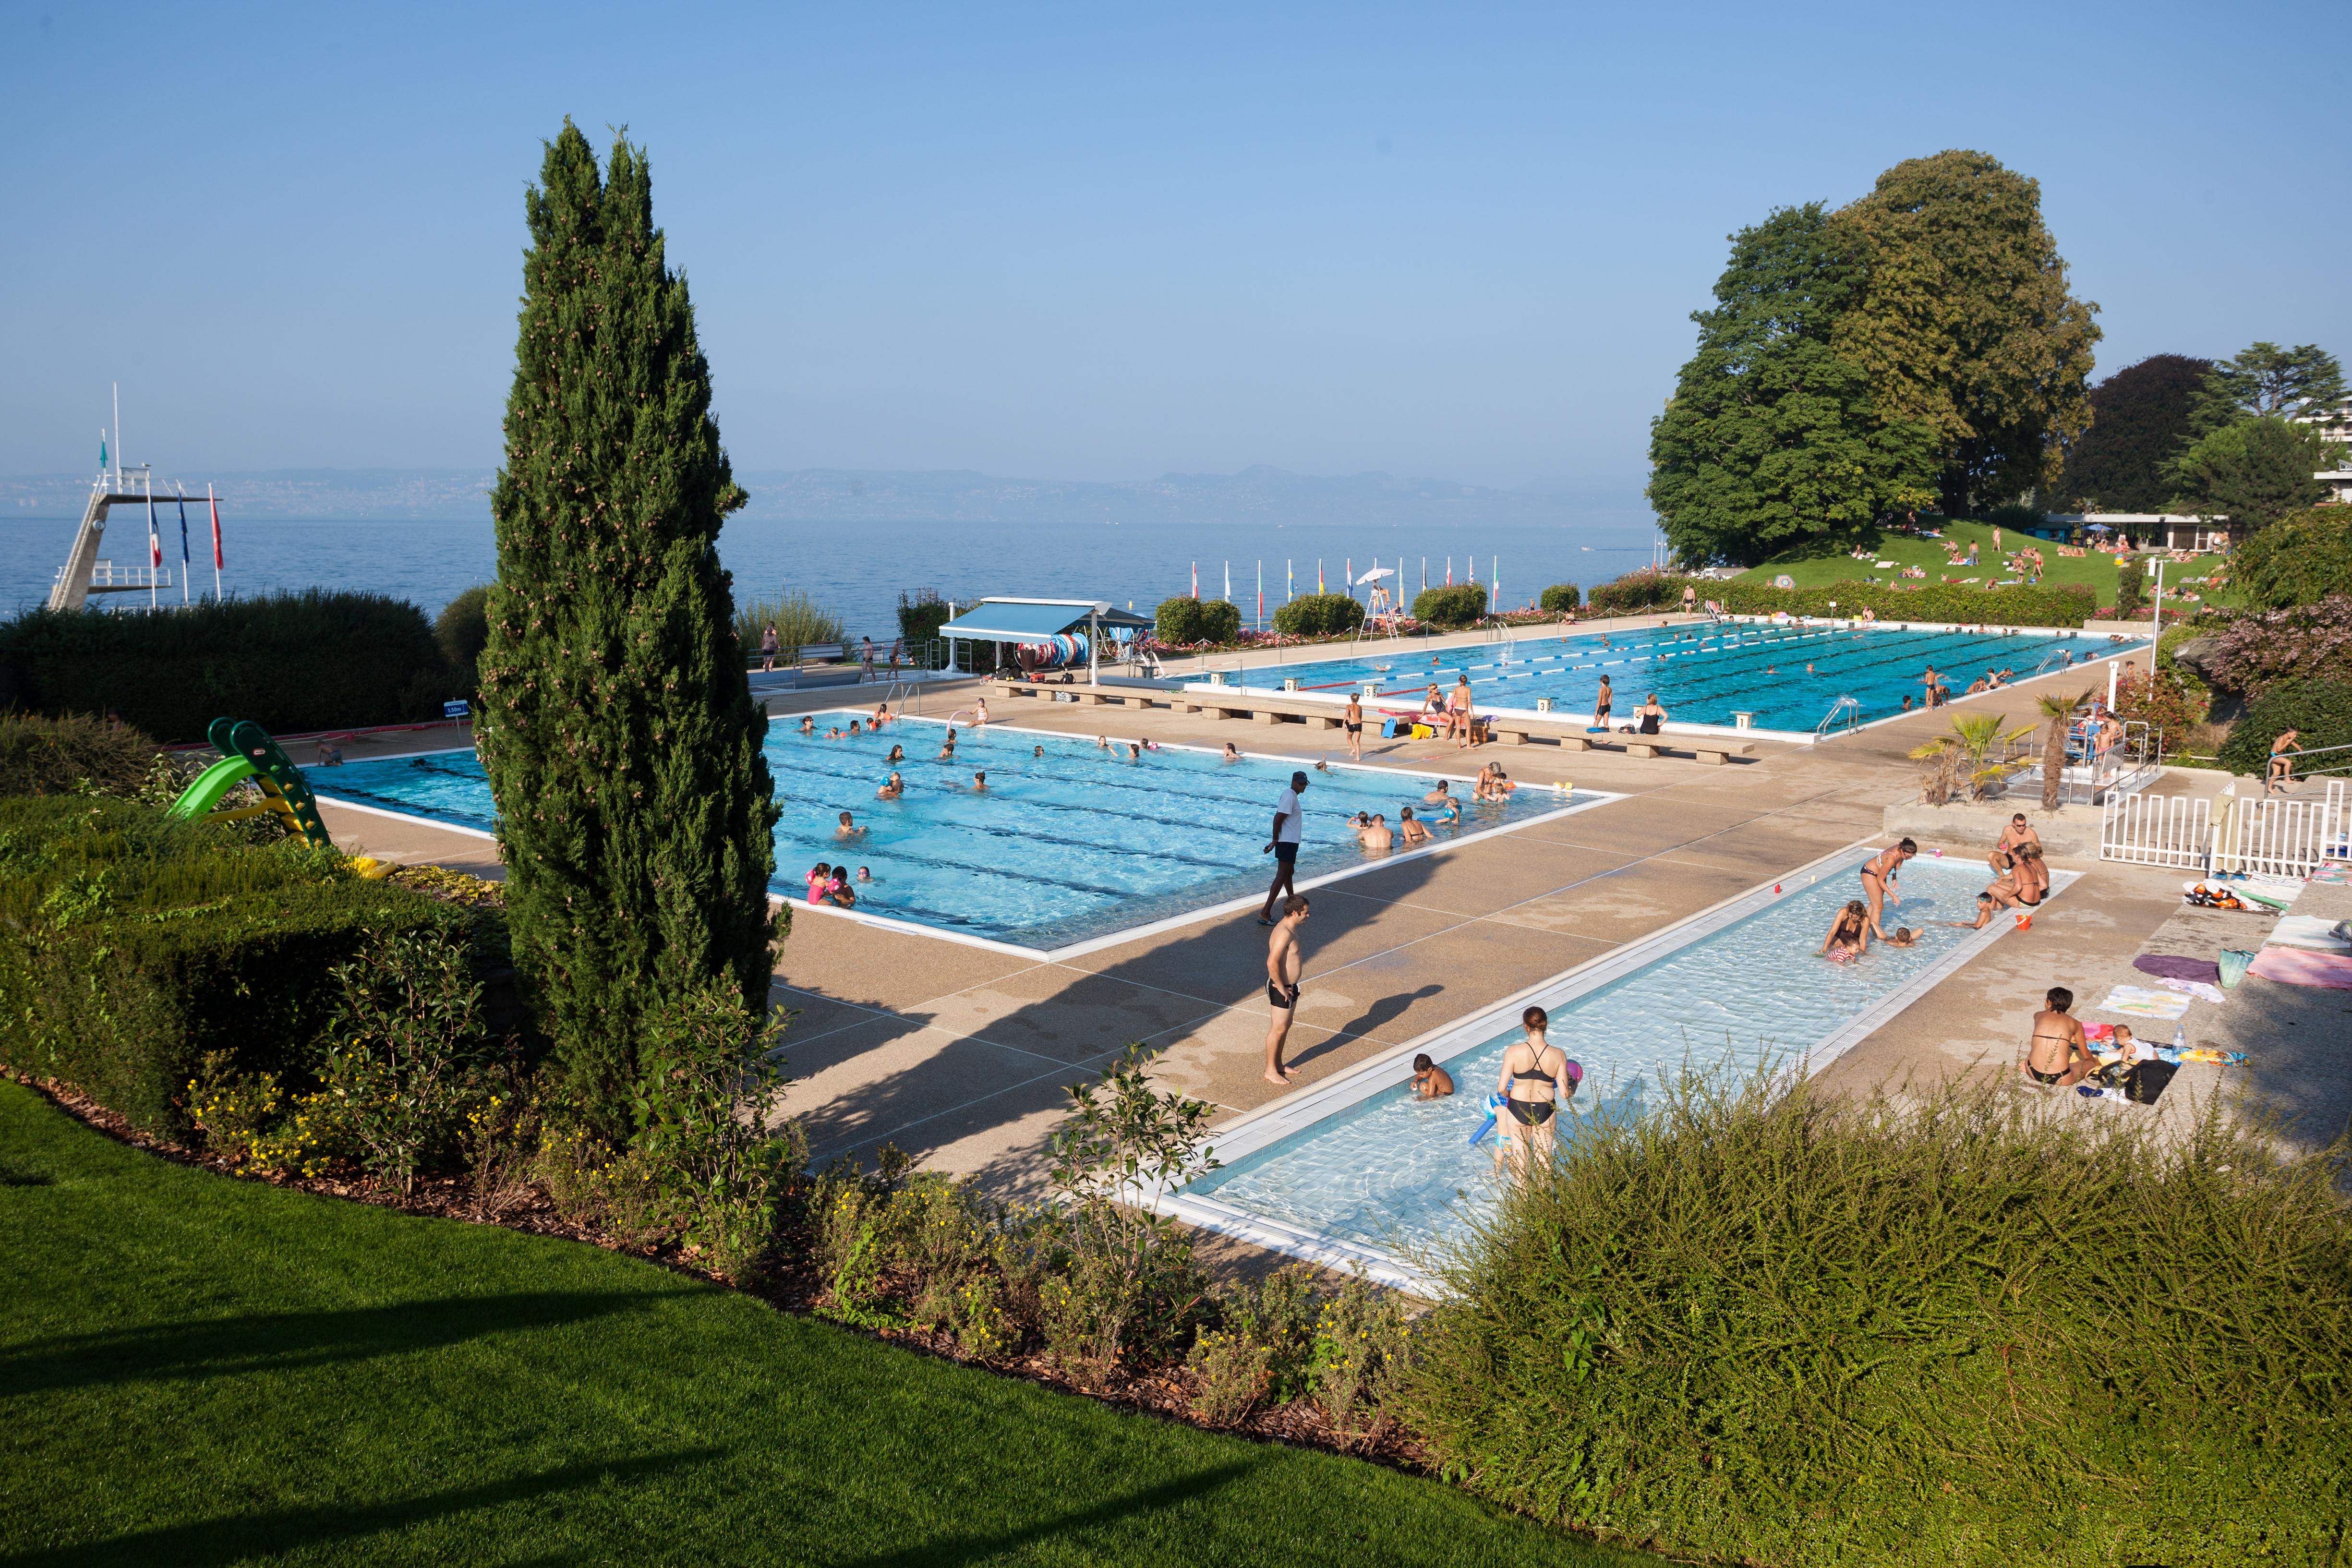 Piscine, Piscine - Bassin Olympique | Ville D'evian tout Piscine Evian